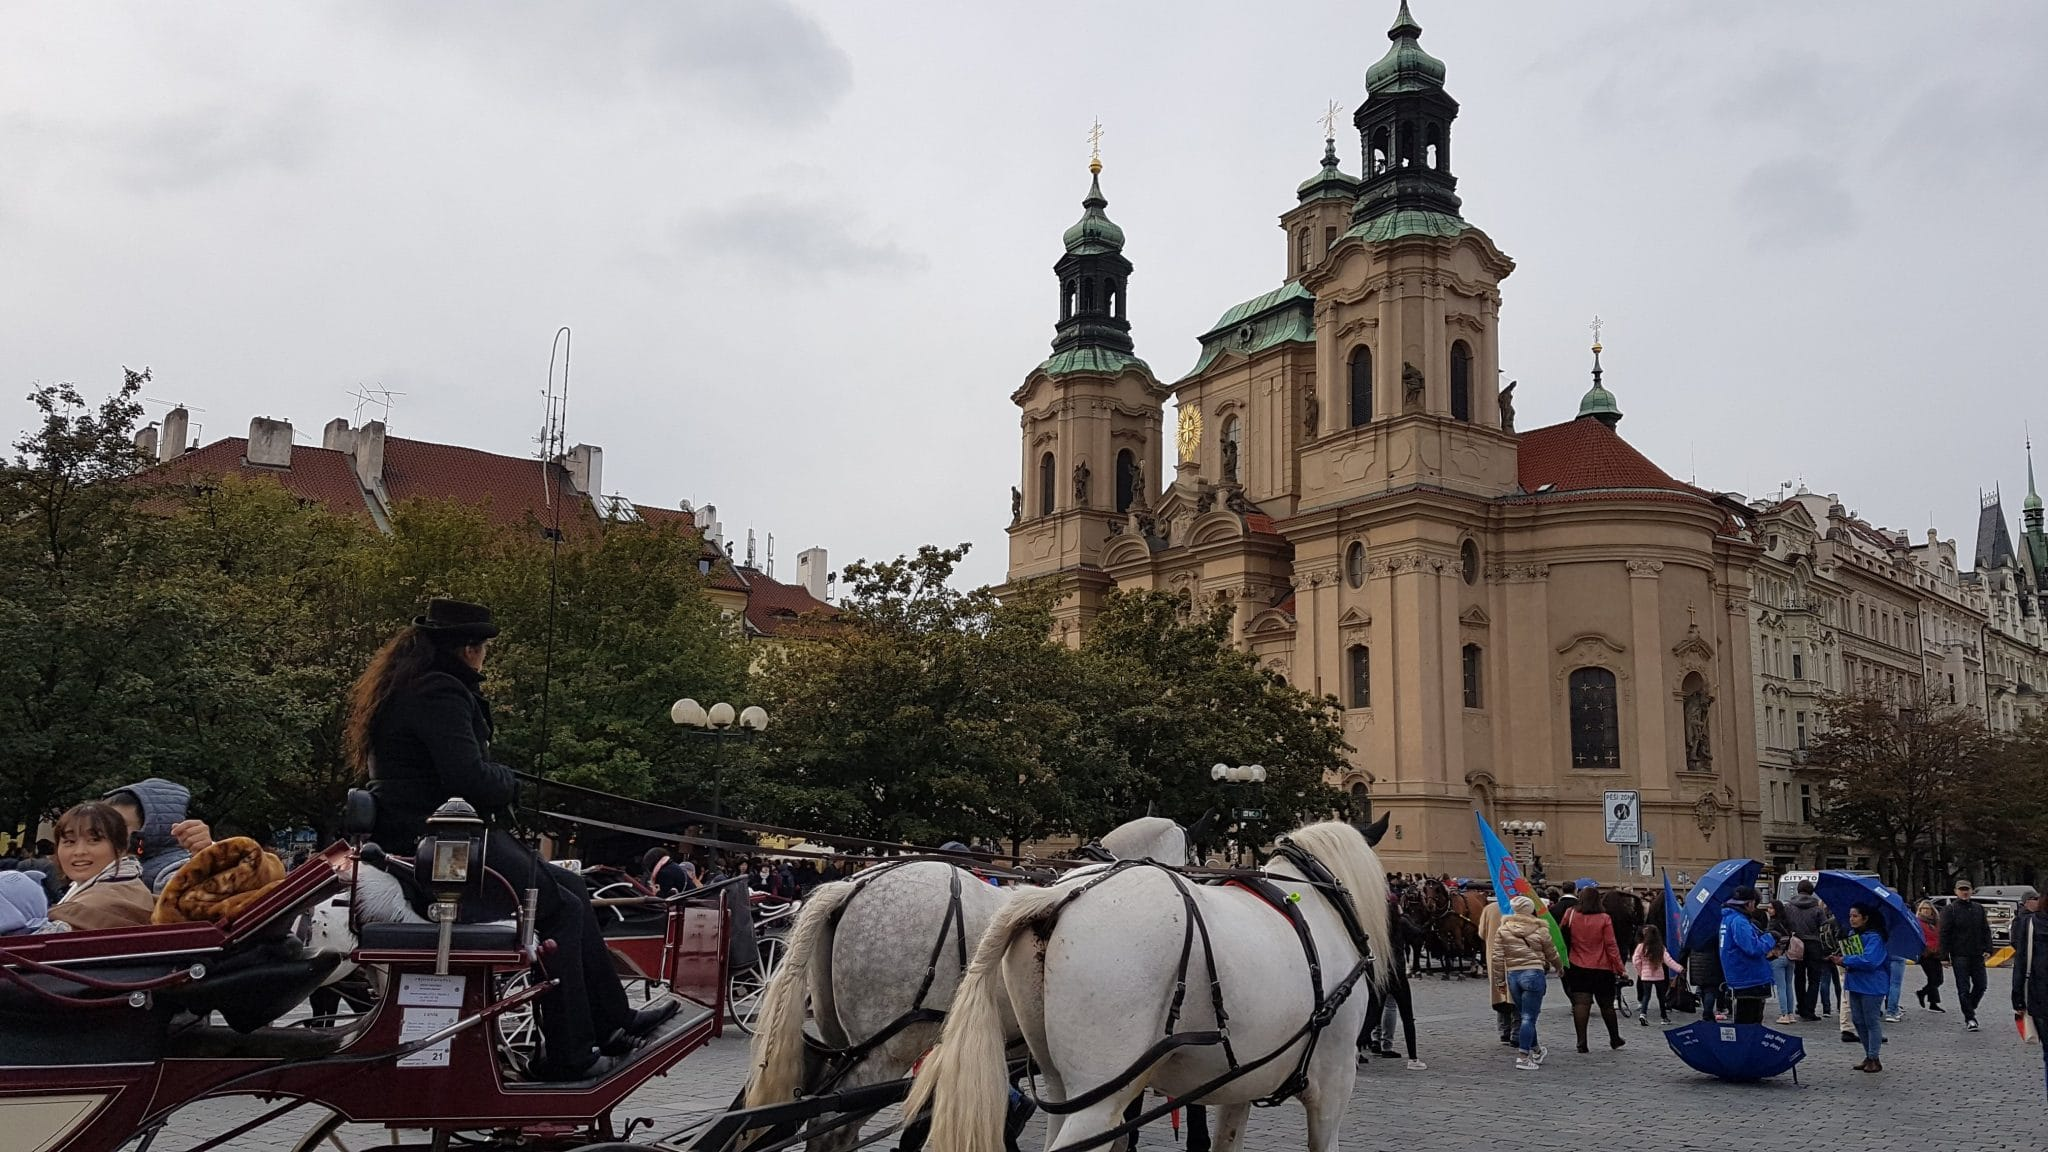 Sina's Reflection: A Phenomenal Trip to Prague